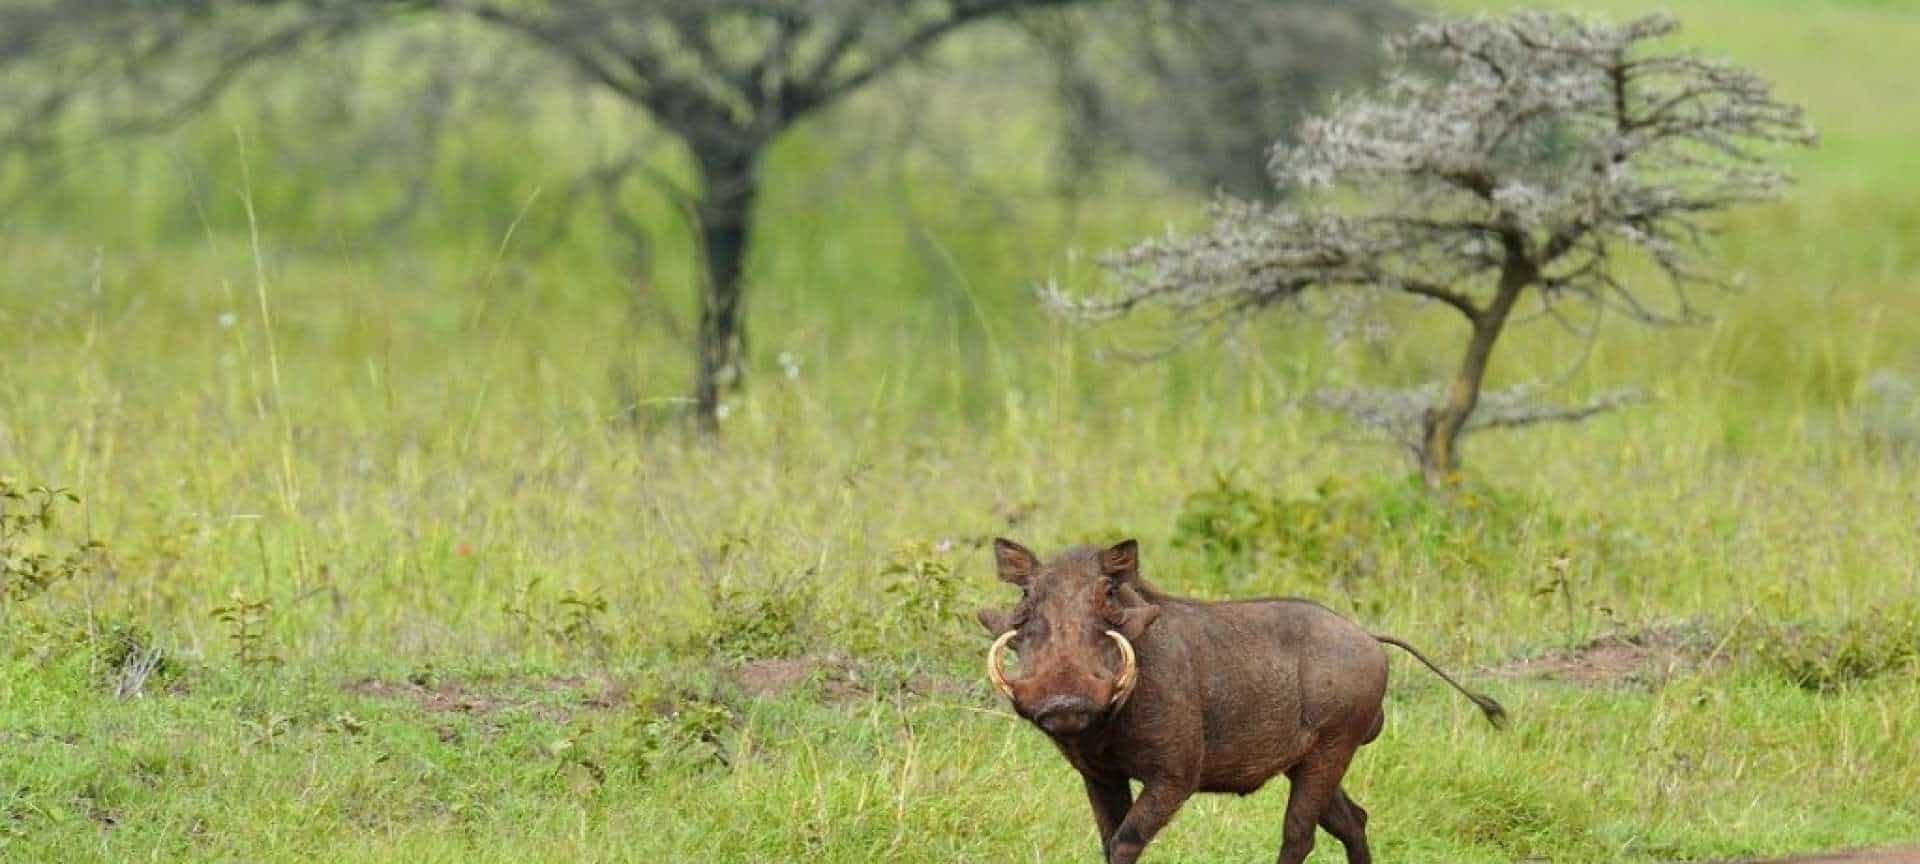 Warthog Nairobi National Park. Photo Kenya Tourist Board. Magical Kenya. Web 1024x680 1920x864